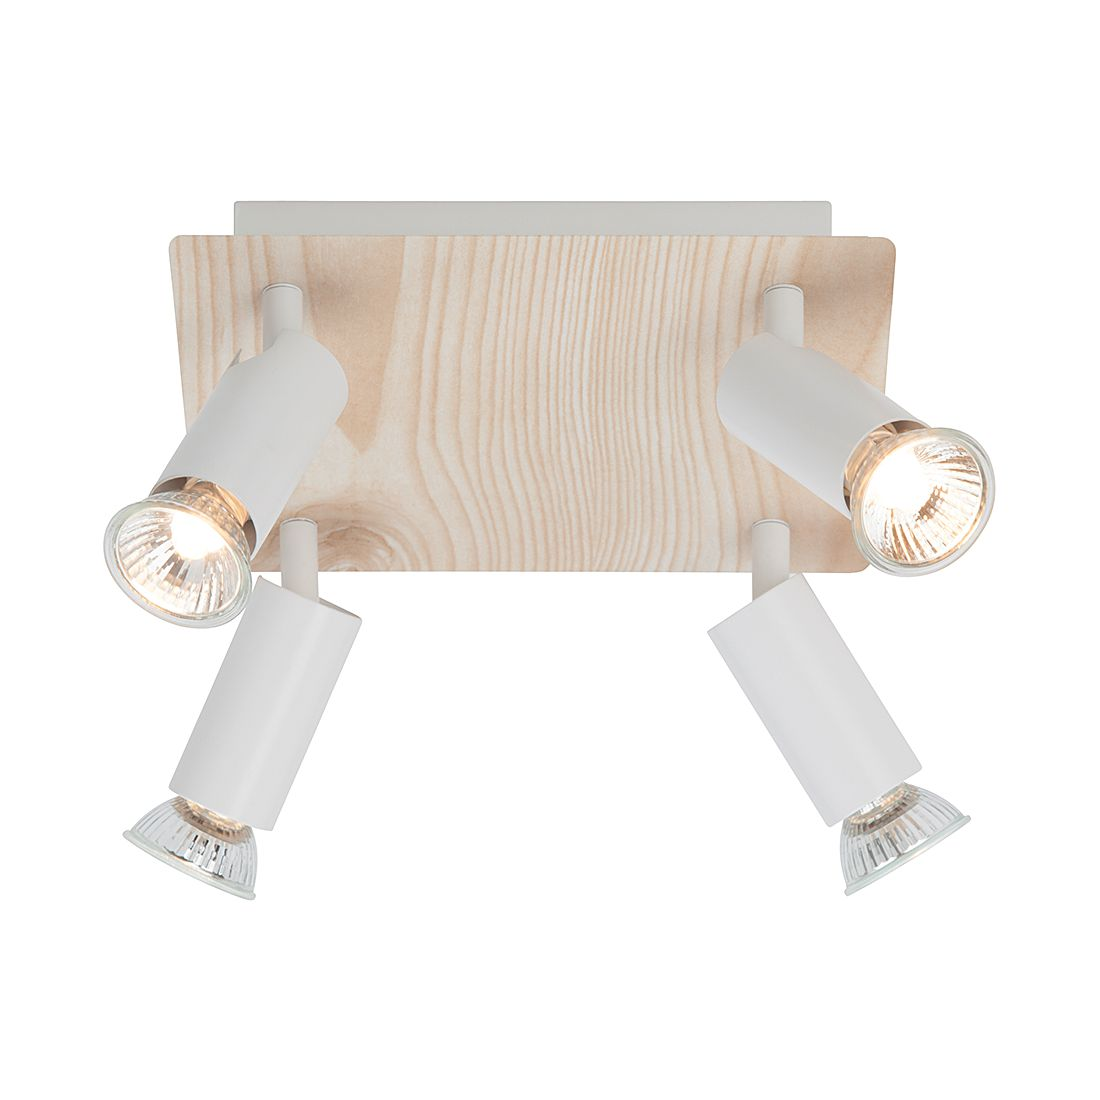 Wandleuchte Sally- Aluminium/Metall – Weiß – 4-flammig, Brilliant günstig kaufen